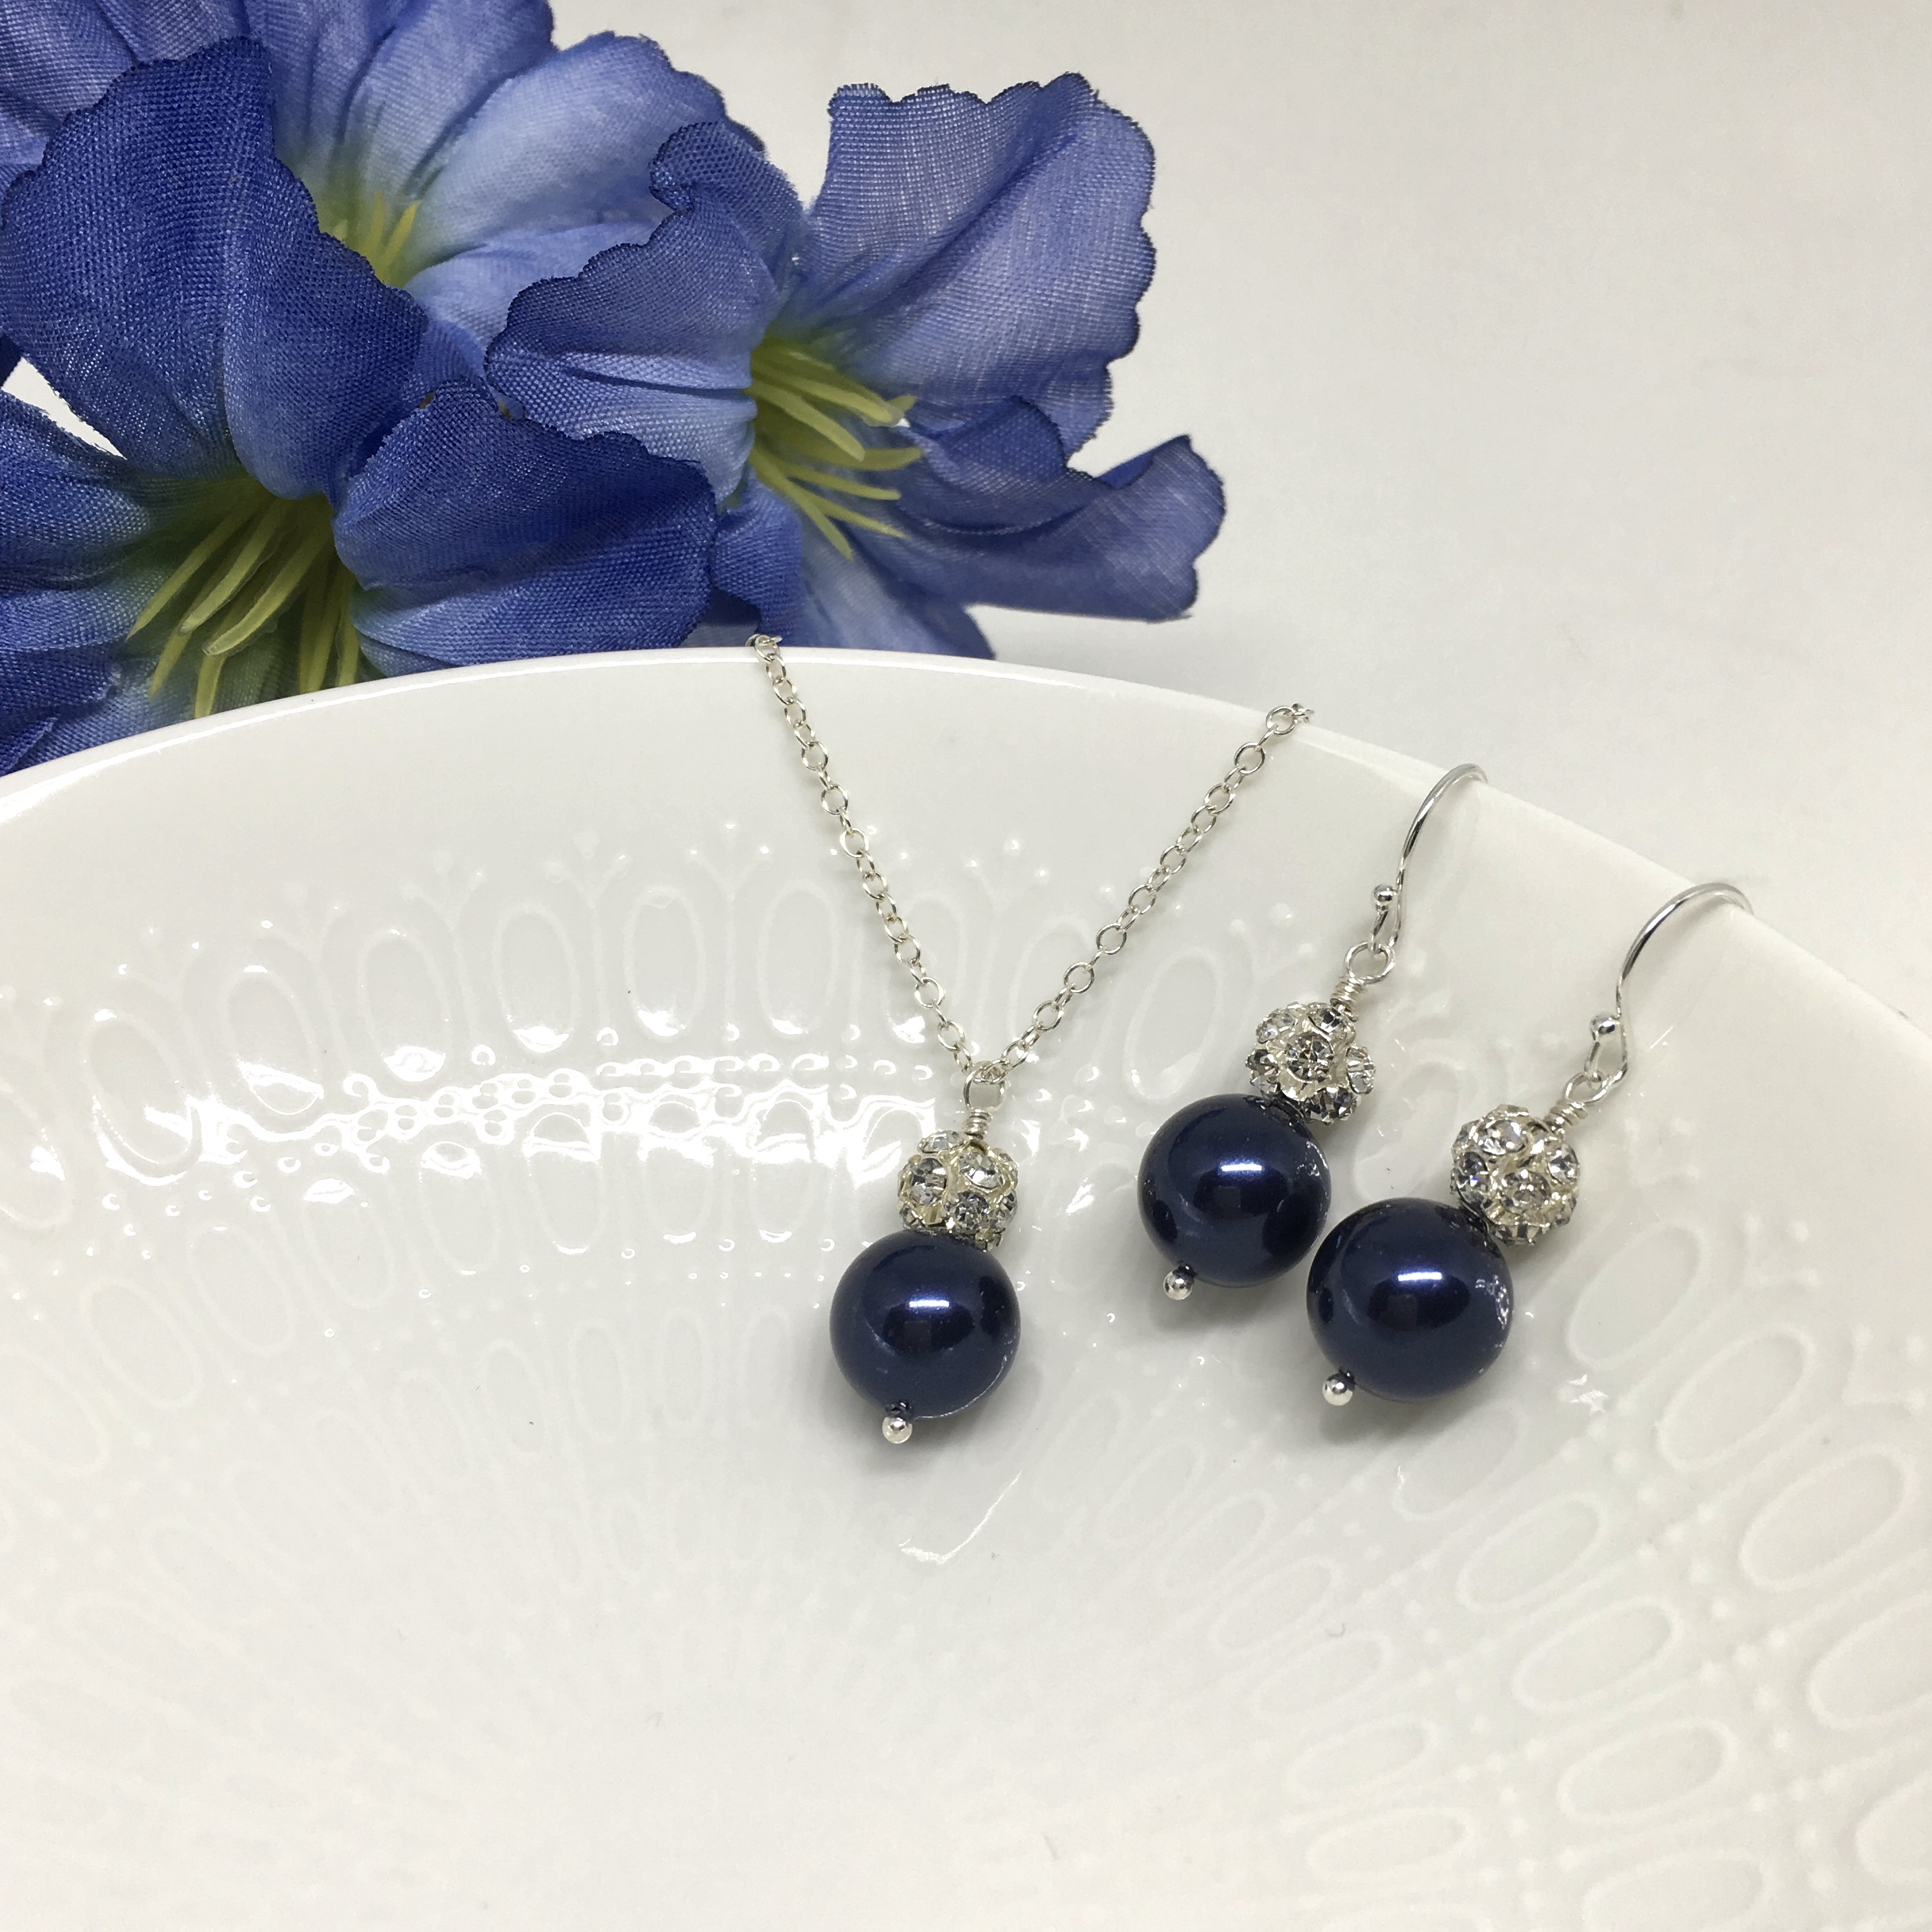 Swarovski Pearl Midnight Blue Bridesmaid Jewelry